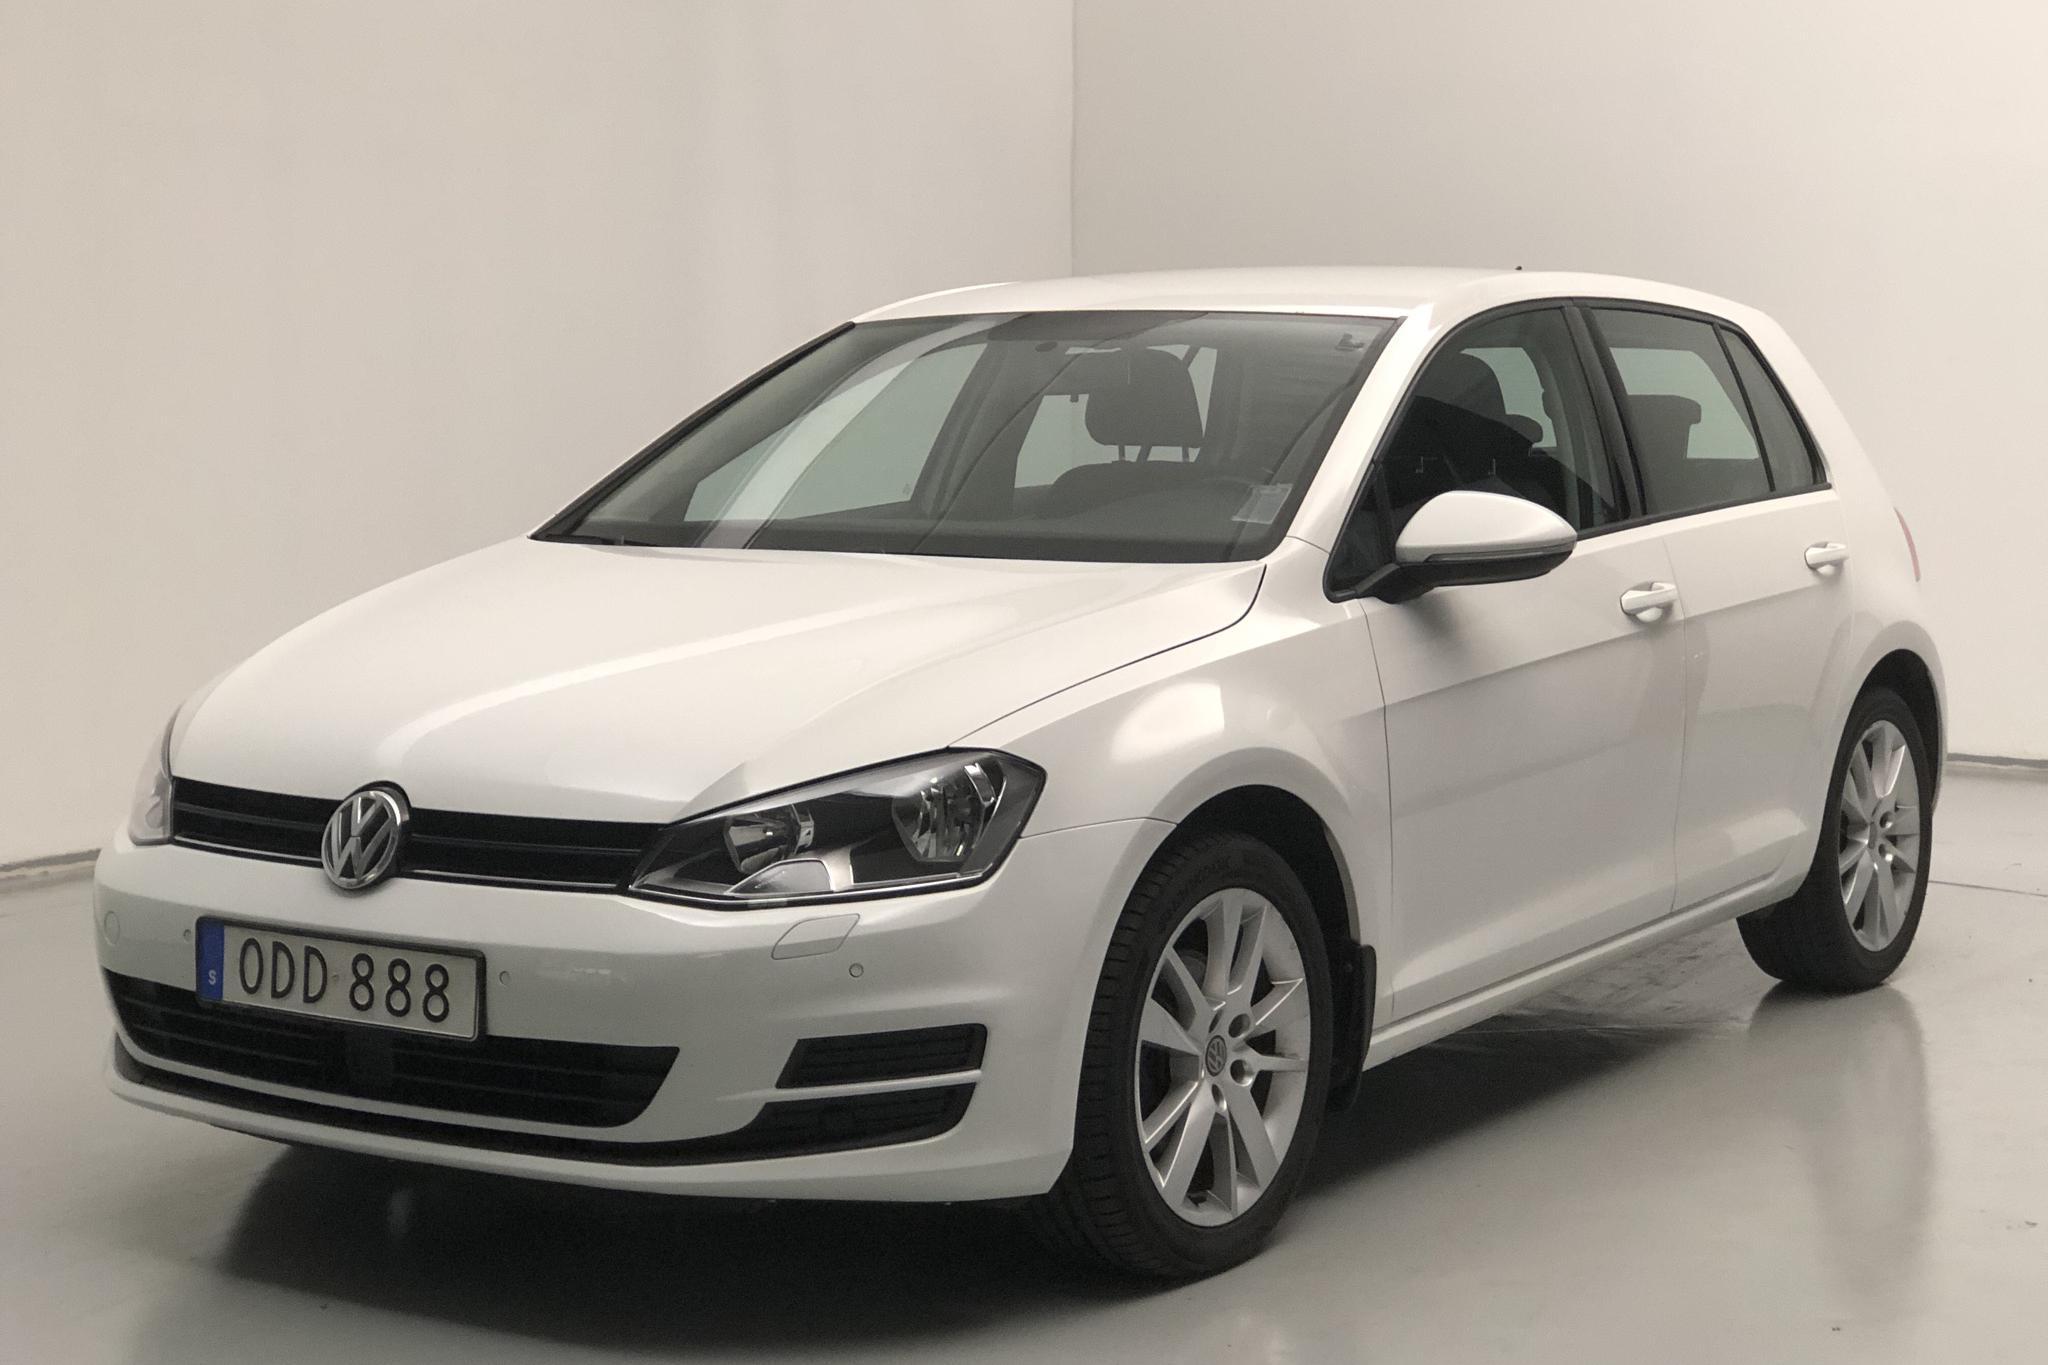 VW Golf VII 1.4 TSI Multifuel 5dr (125hk)